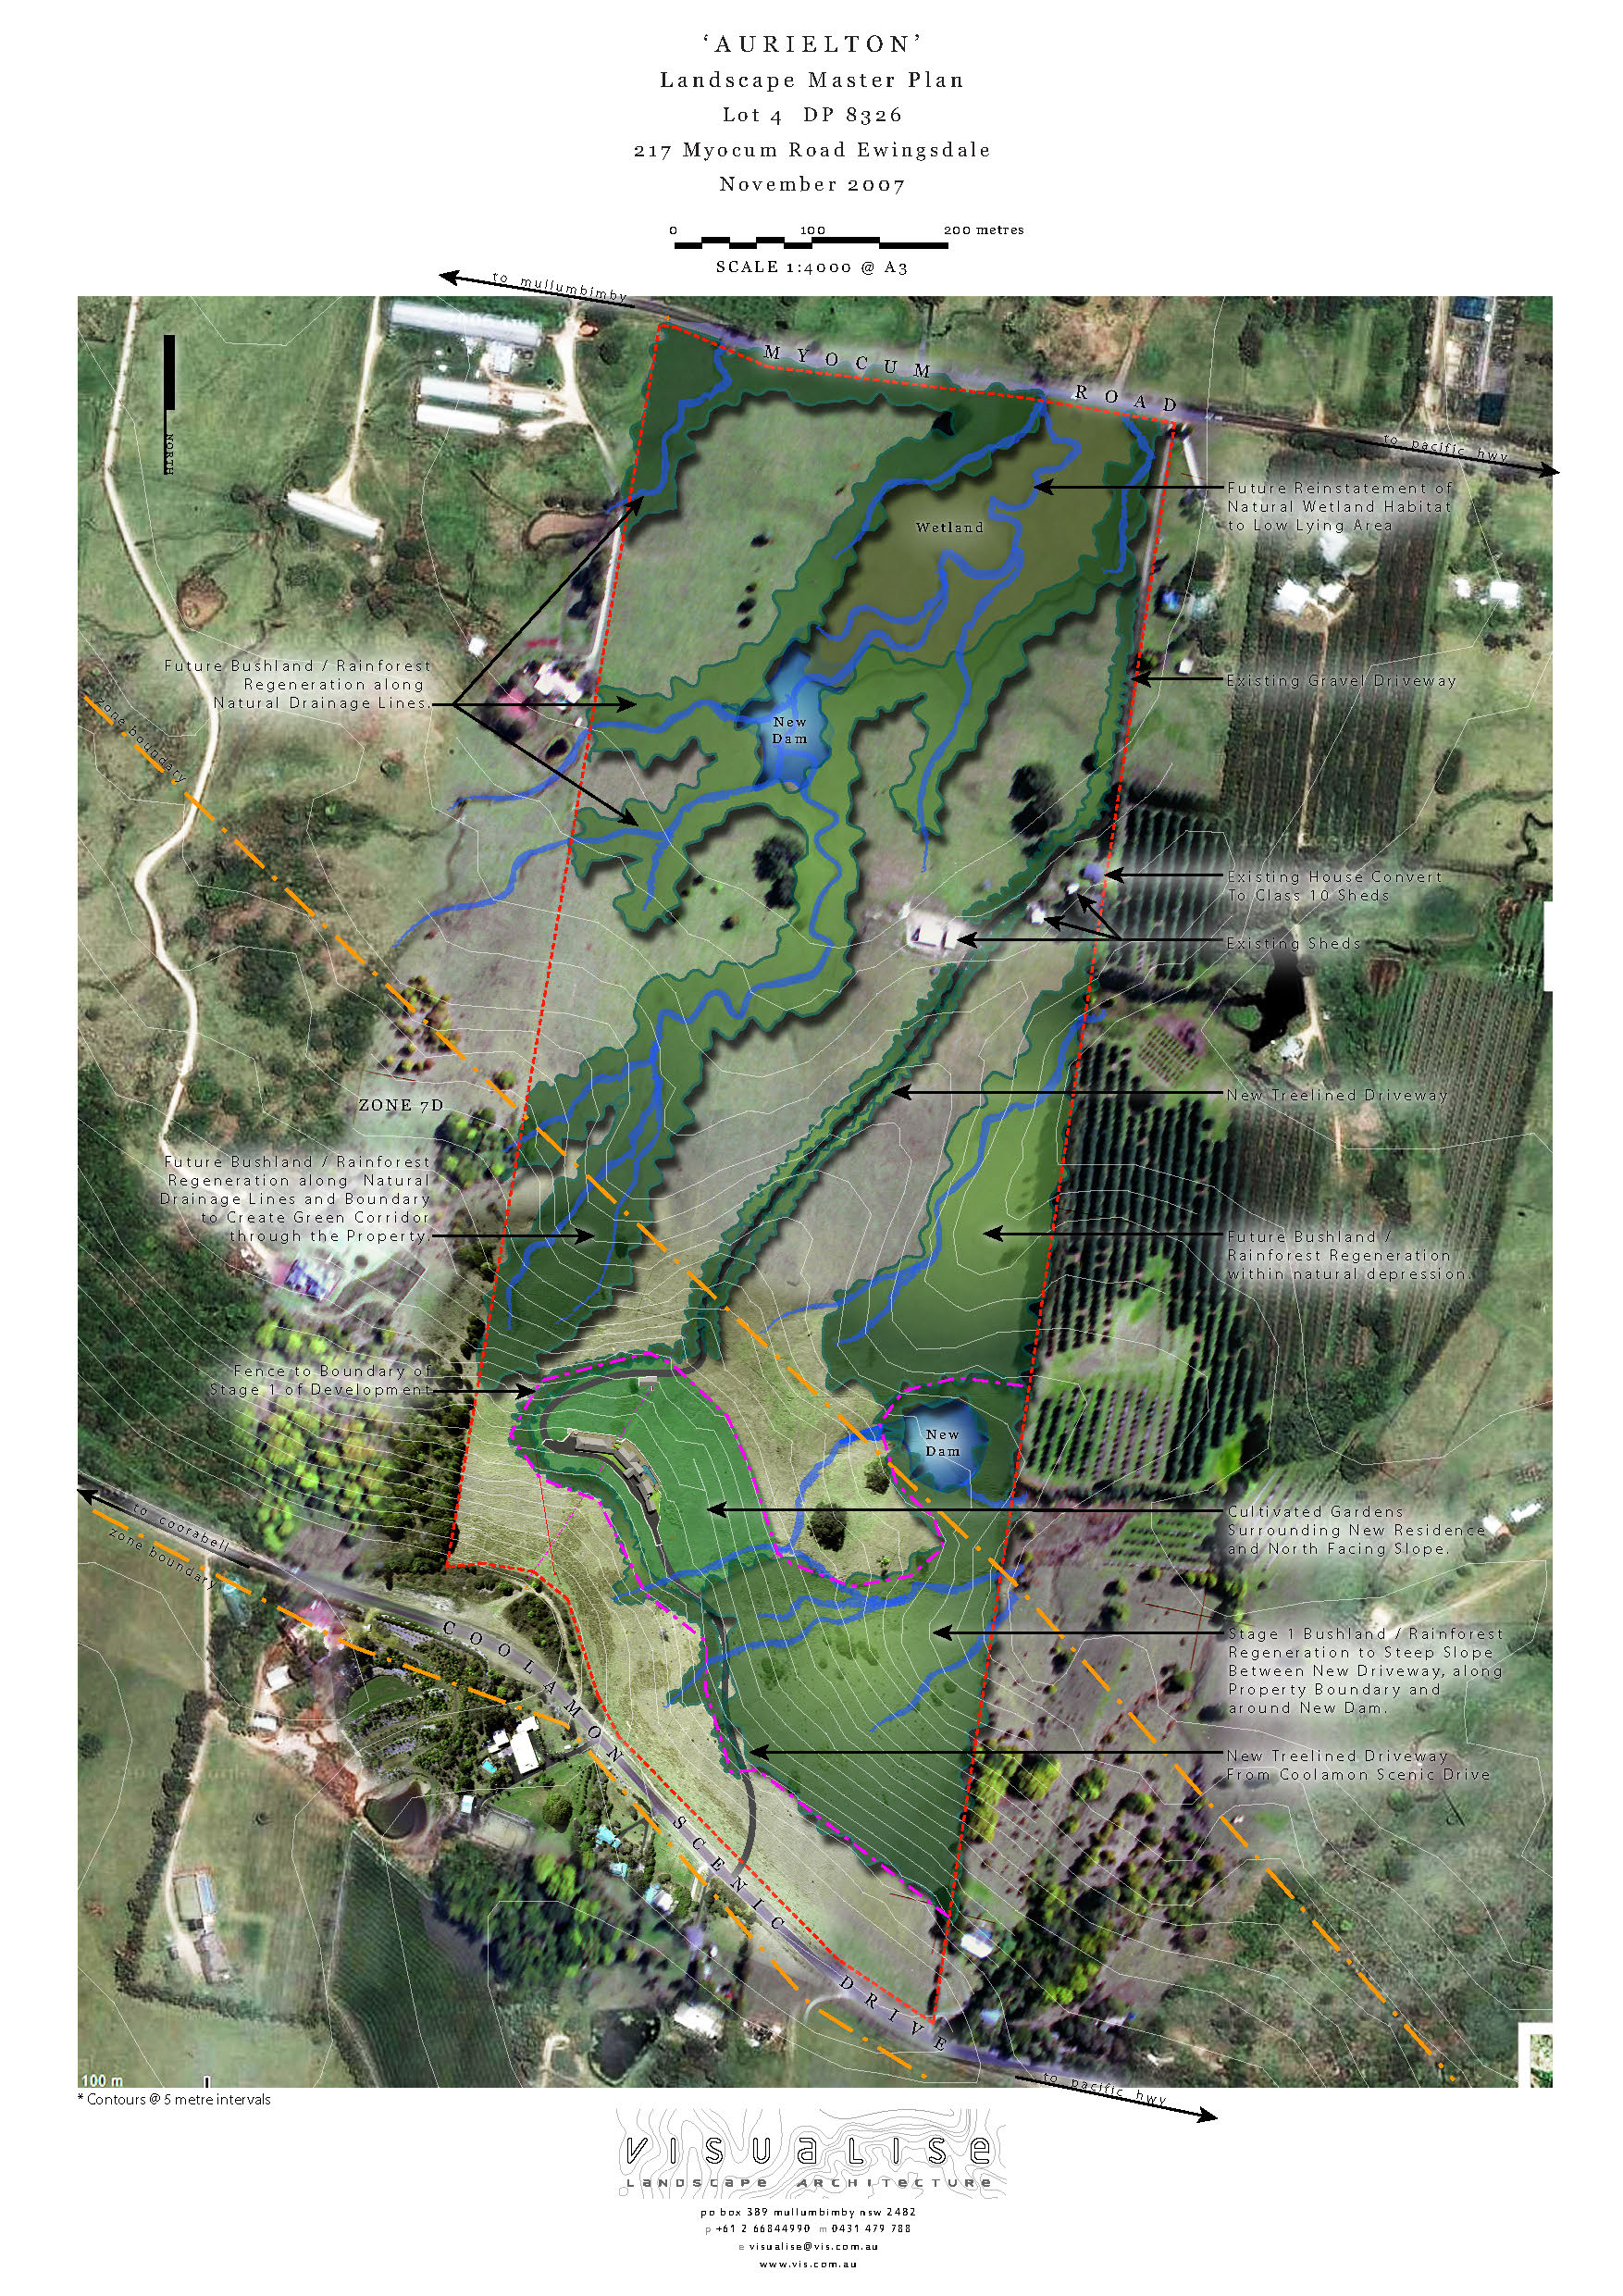 Landscape Master plan final small.jpg